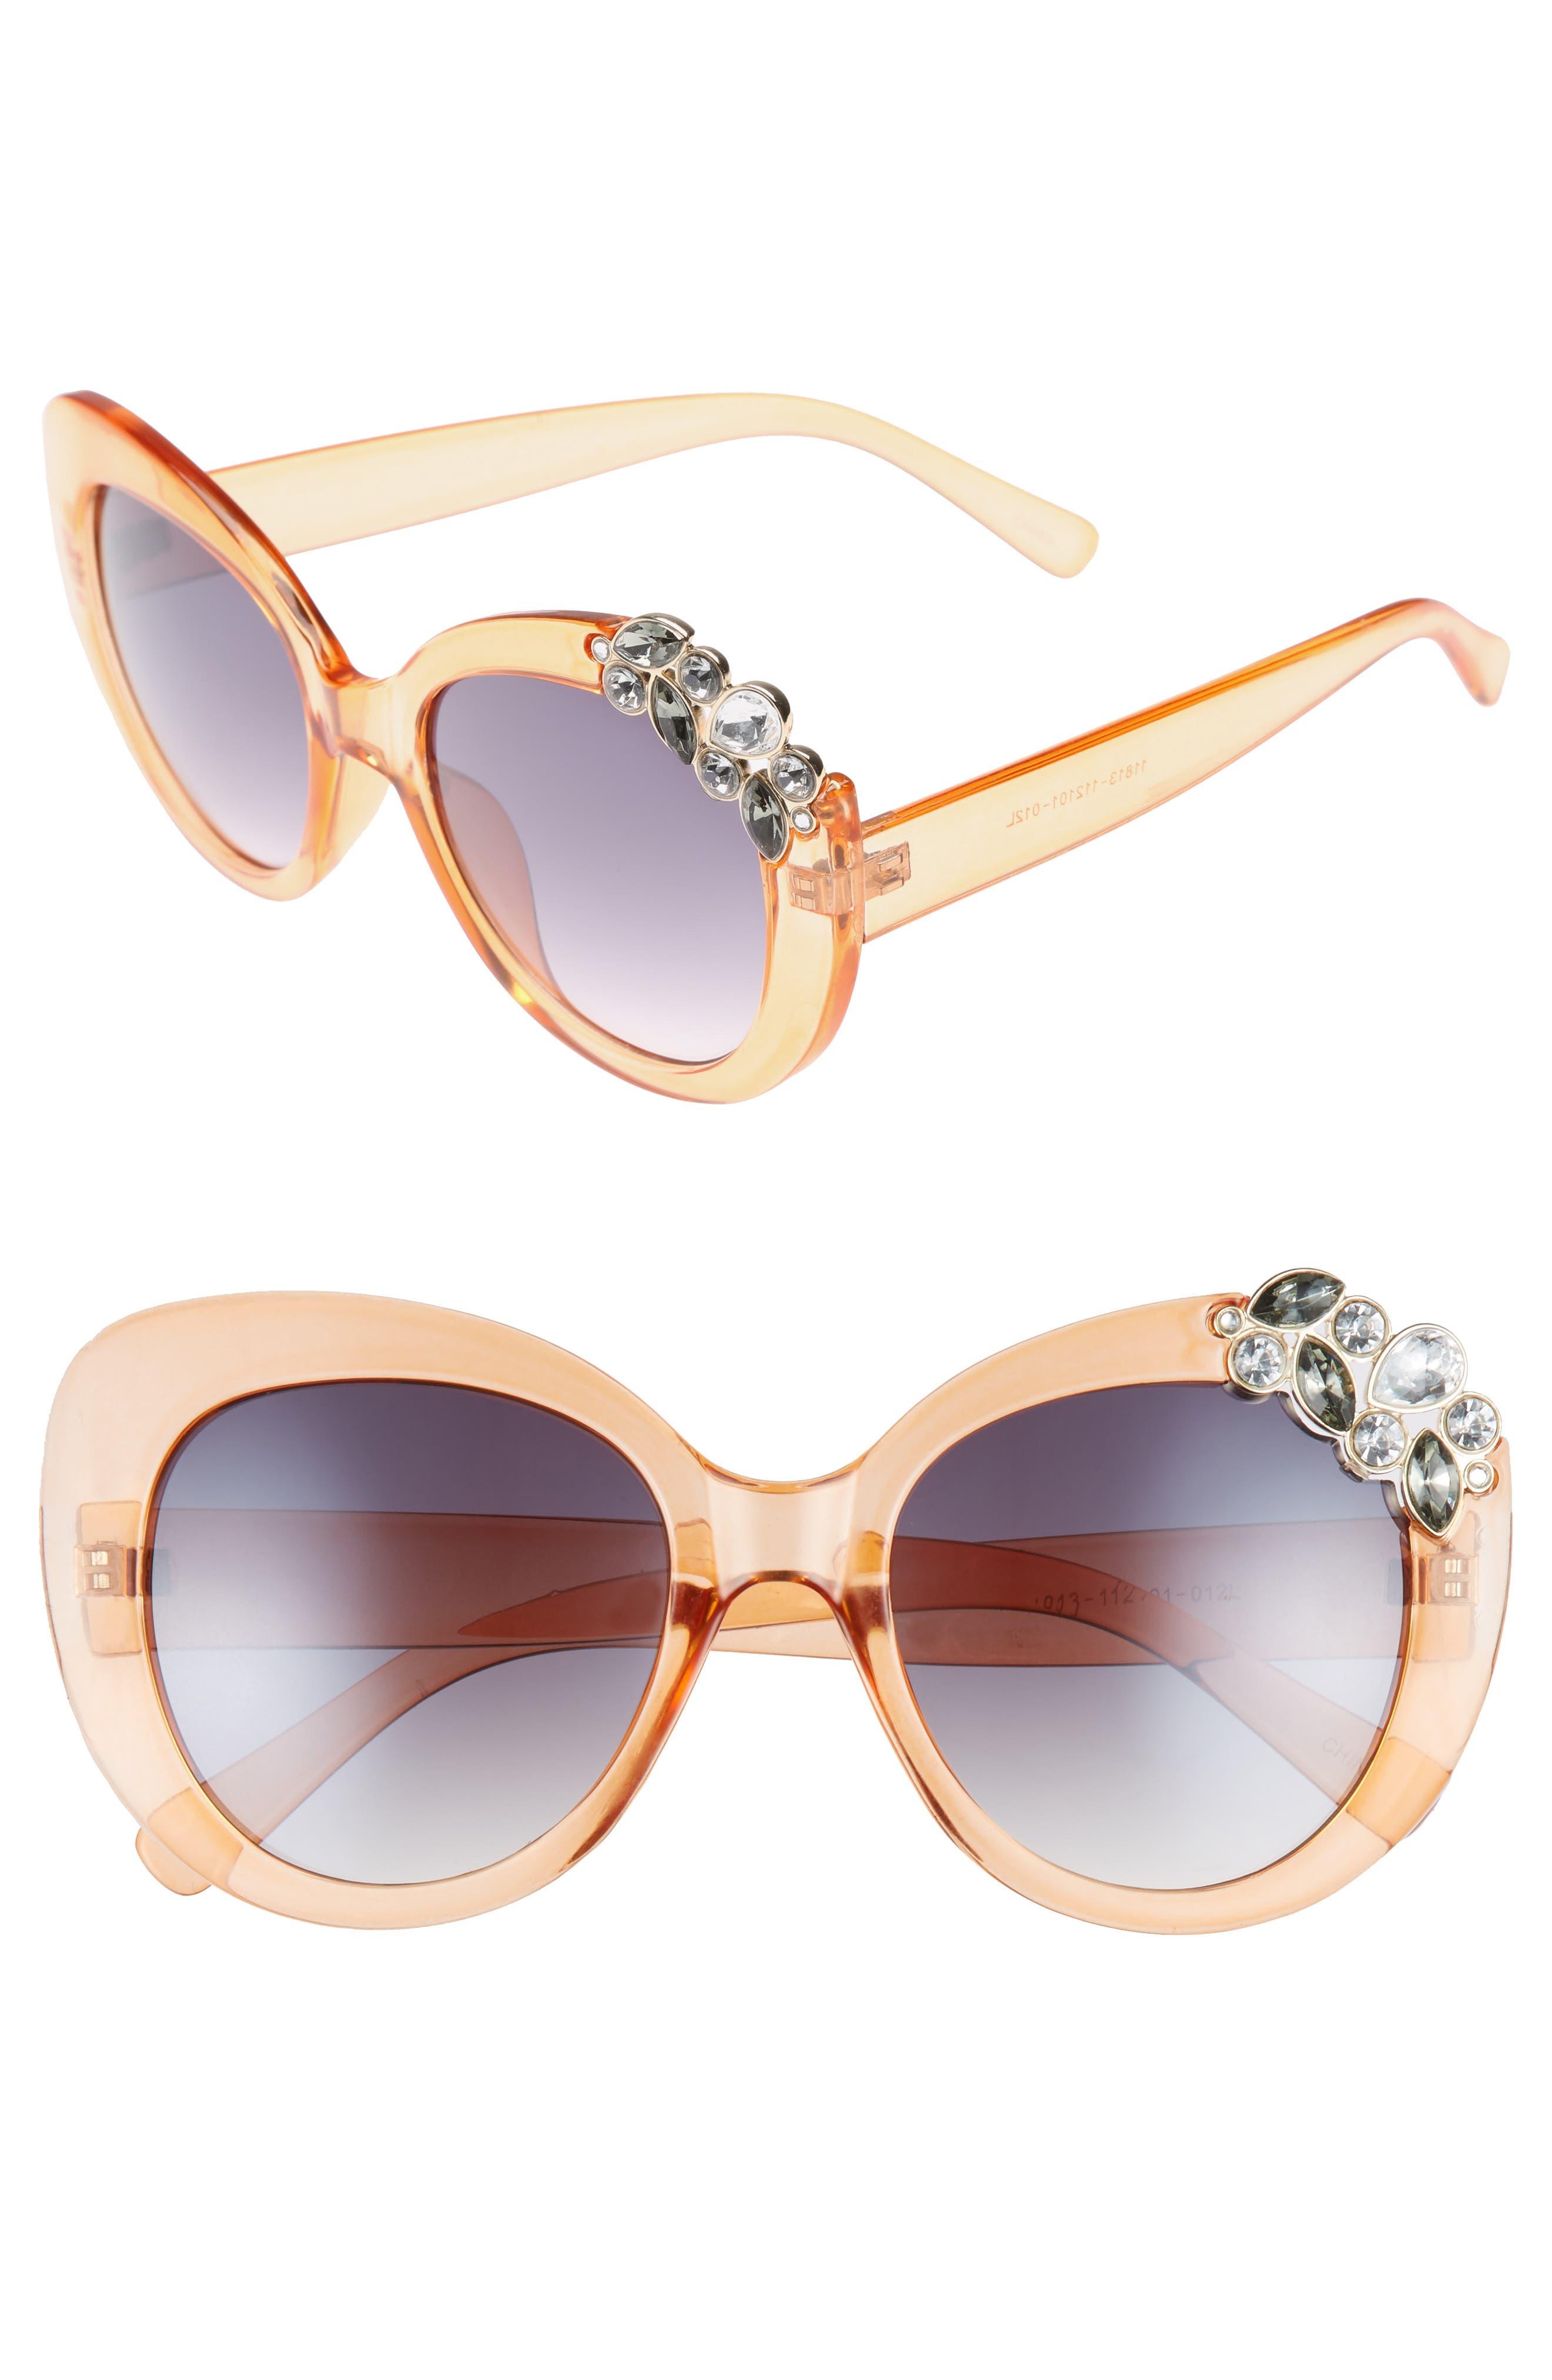 Crystal Cat Eye Sunglasses,                         Main,                         color, Peach